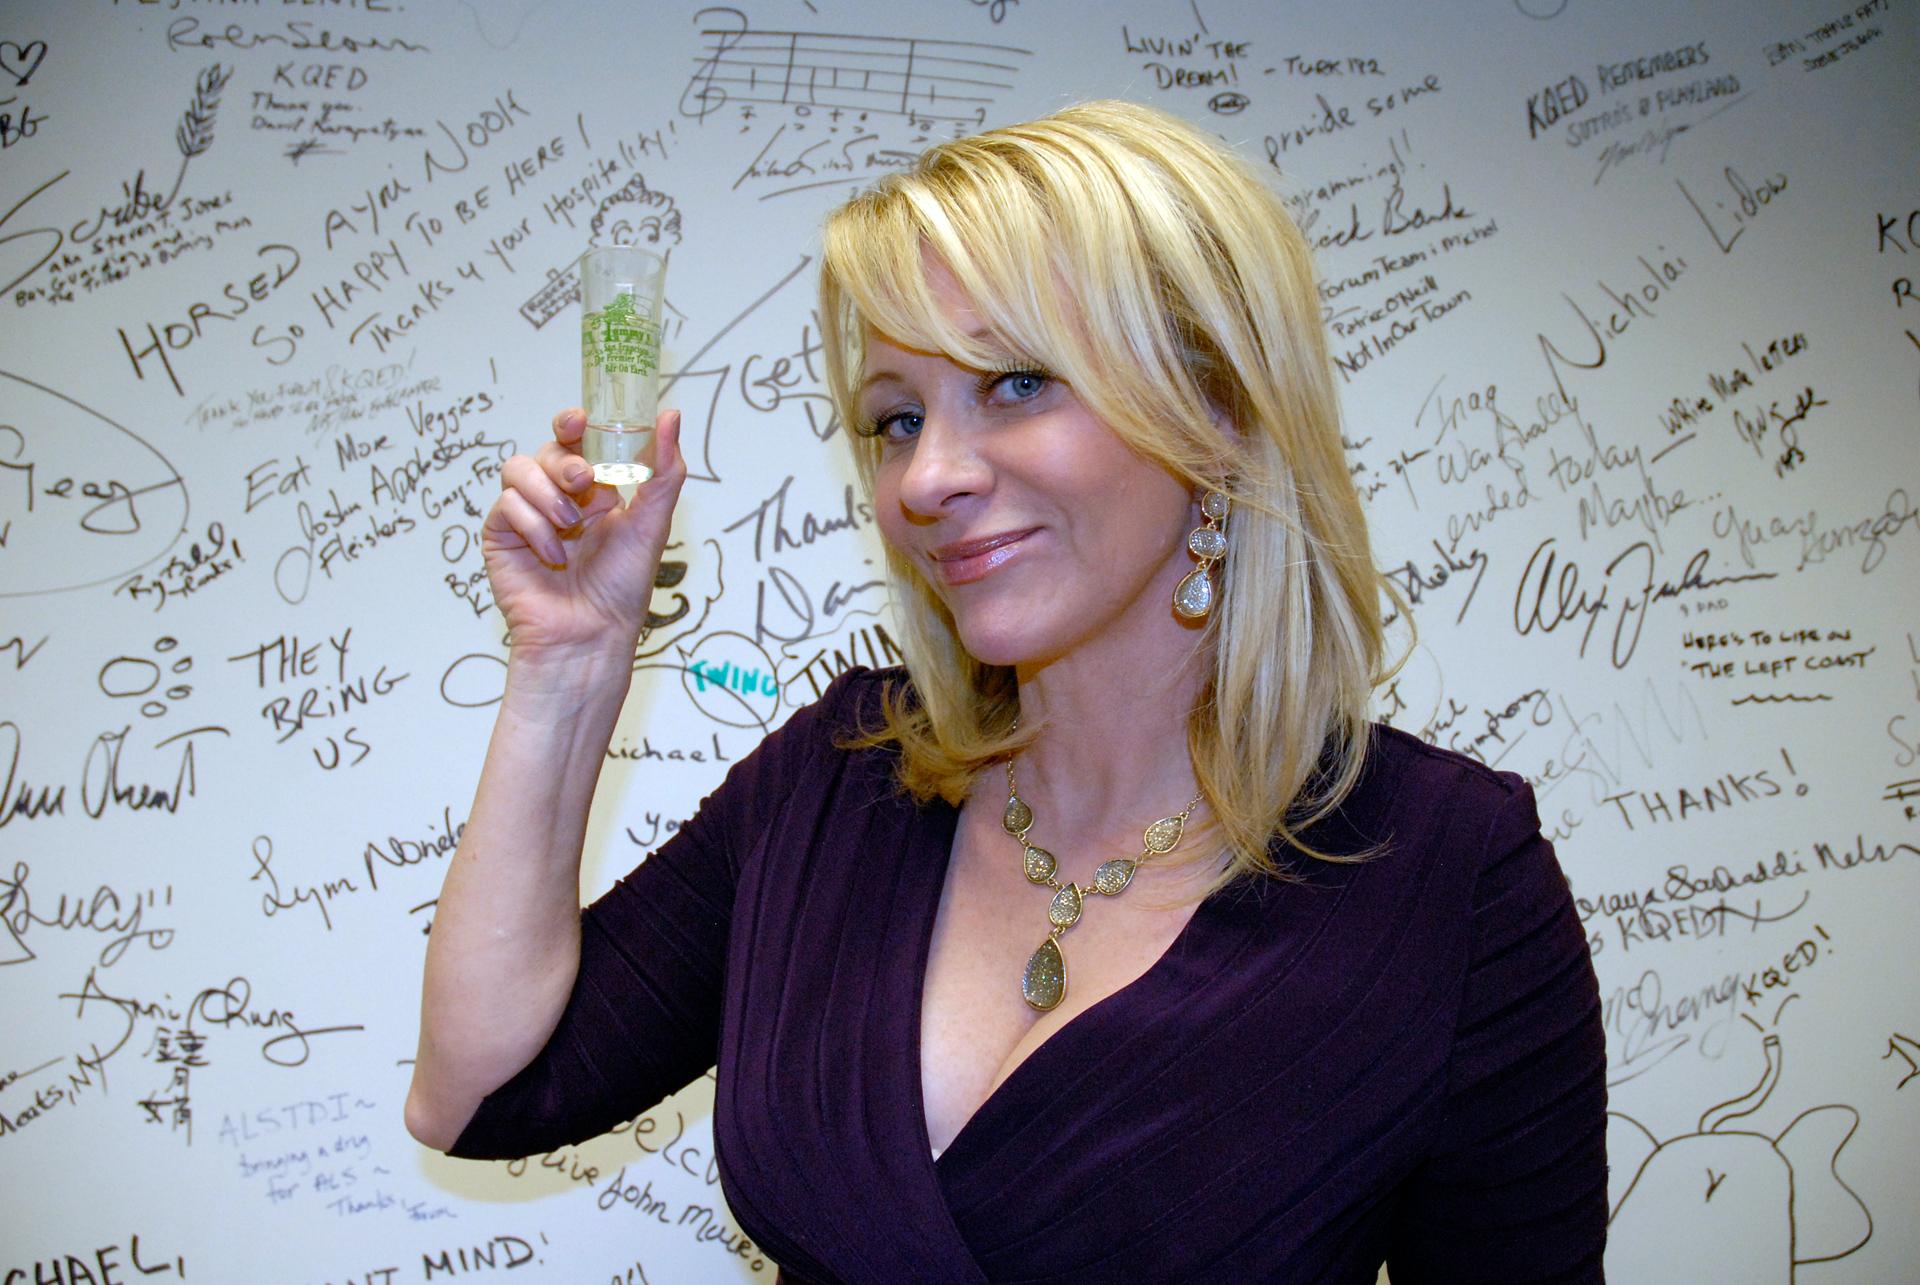 Leslie Sbrocco loves tequila